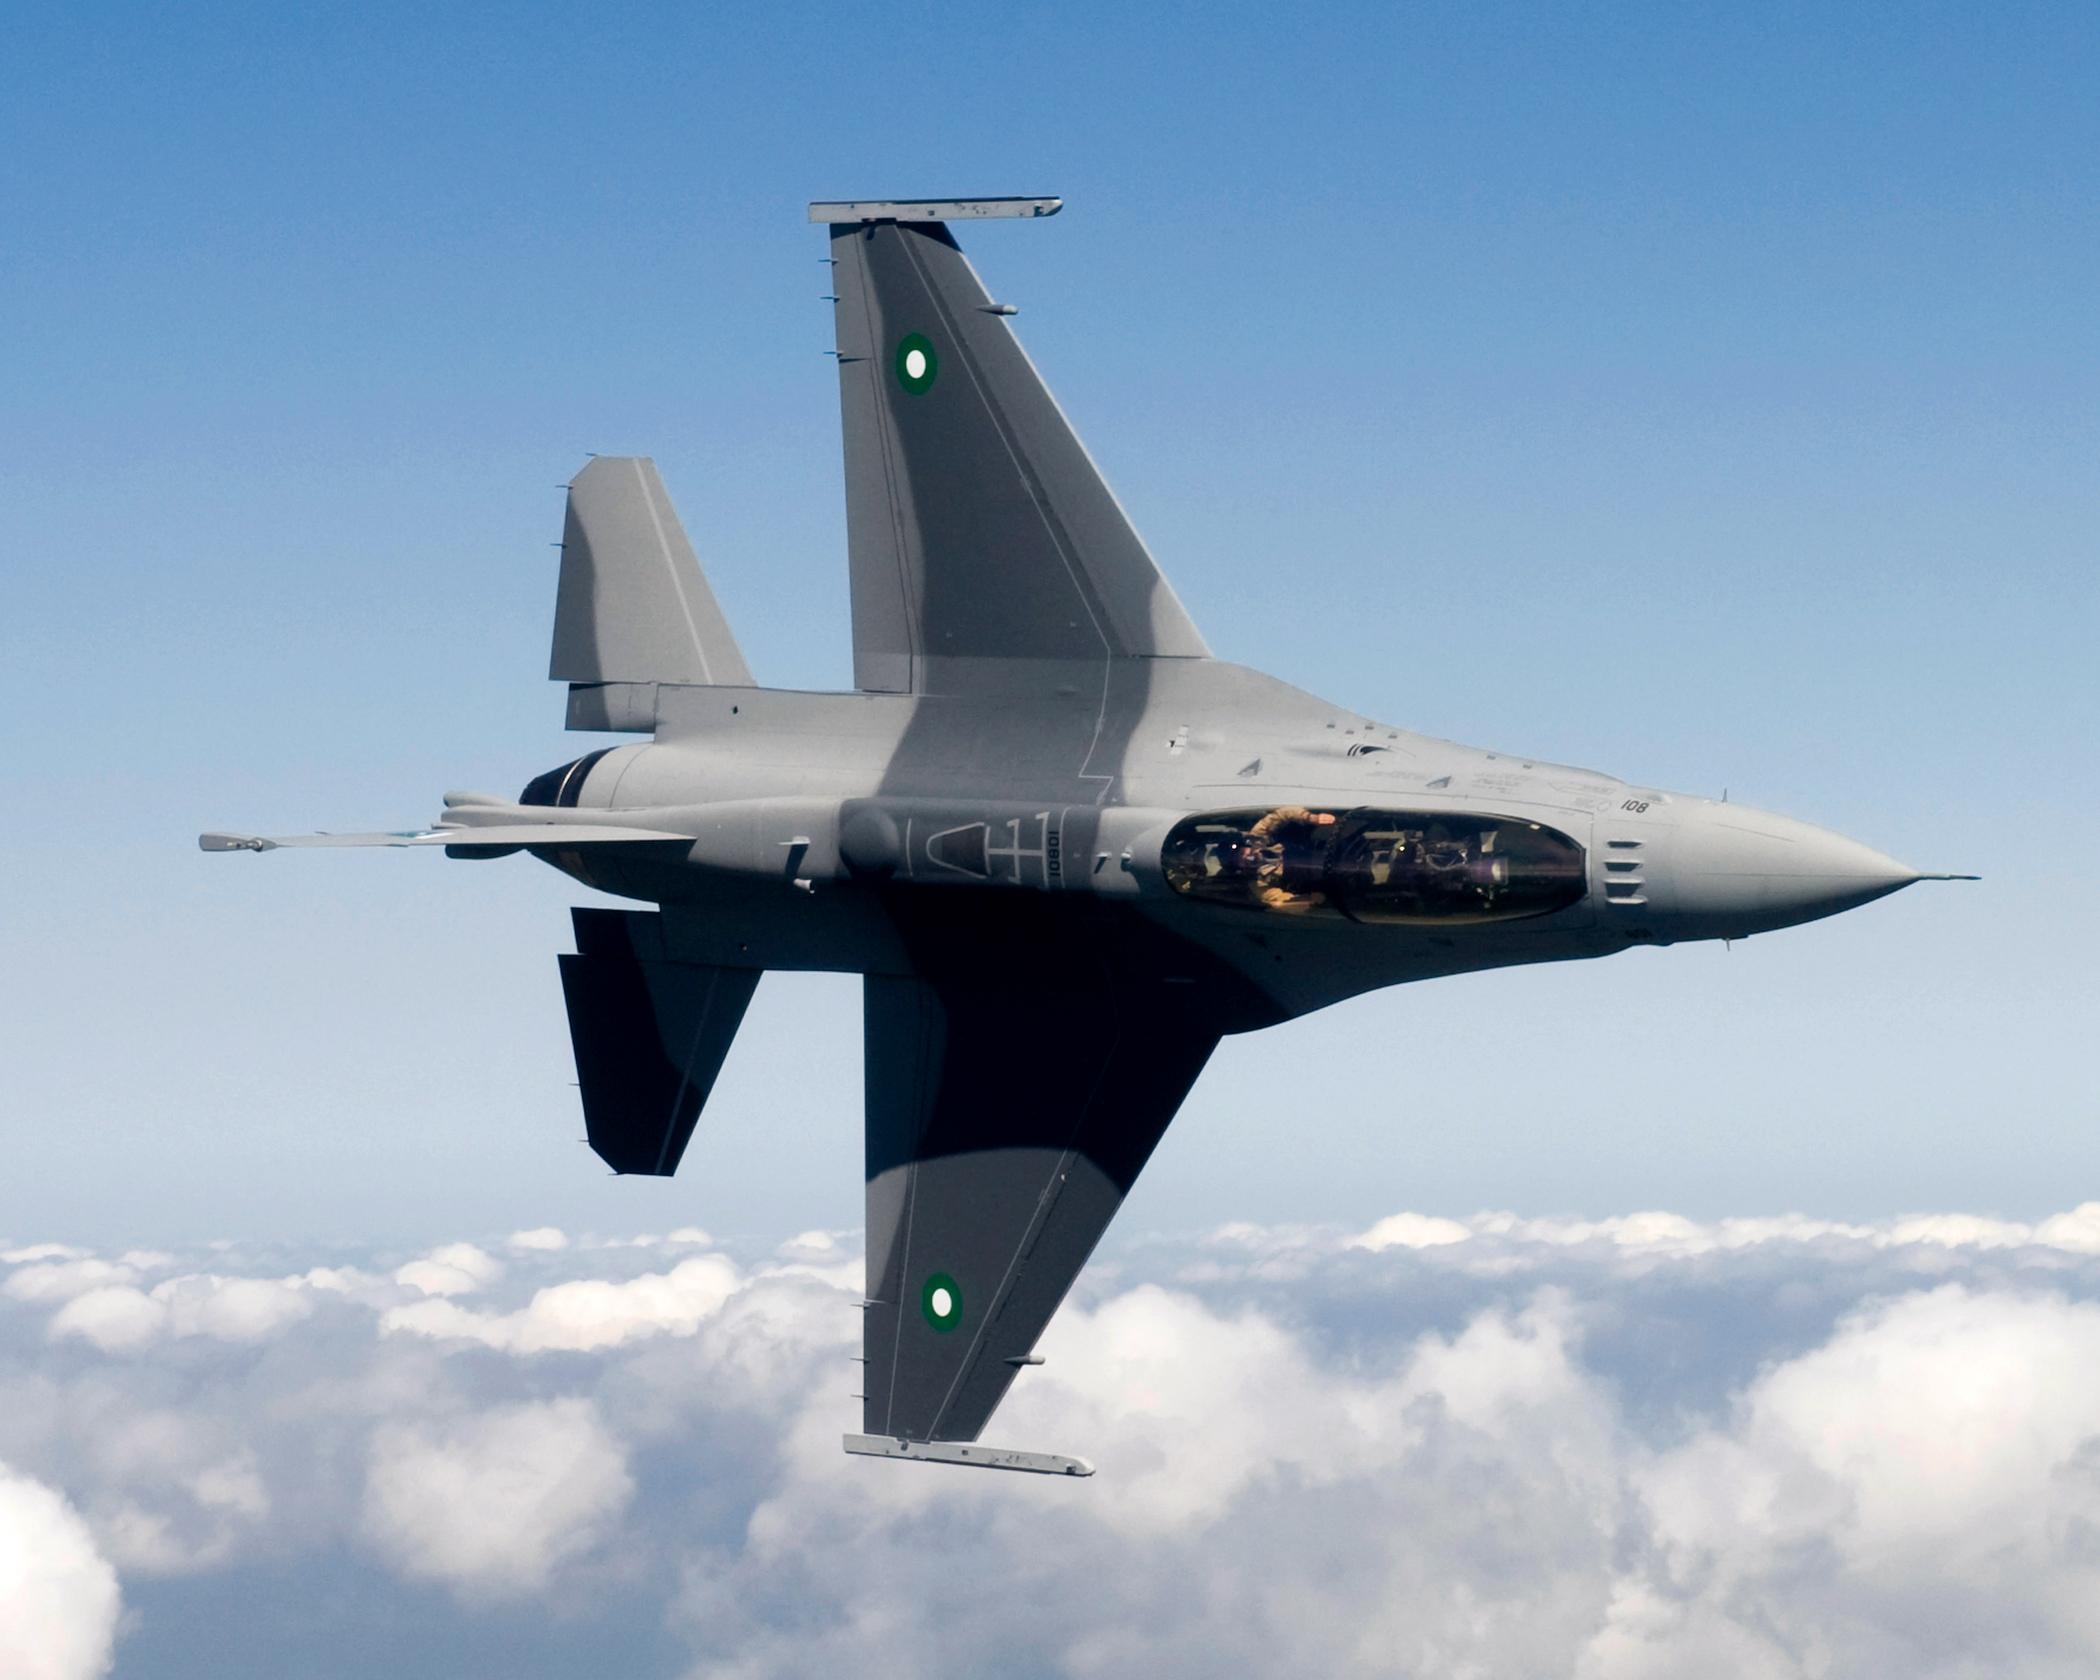 Americká F-16 je najrozšírenejšia stíhačka na svete. Využíva ju 26 krajín. Foto - Wikipedia